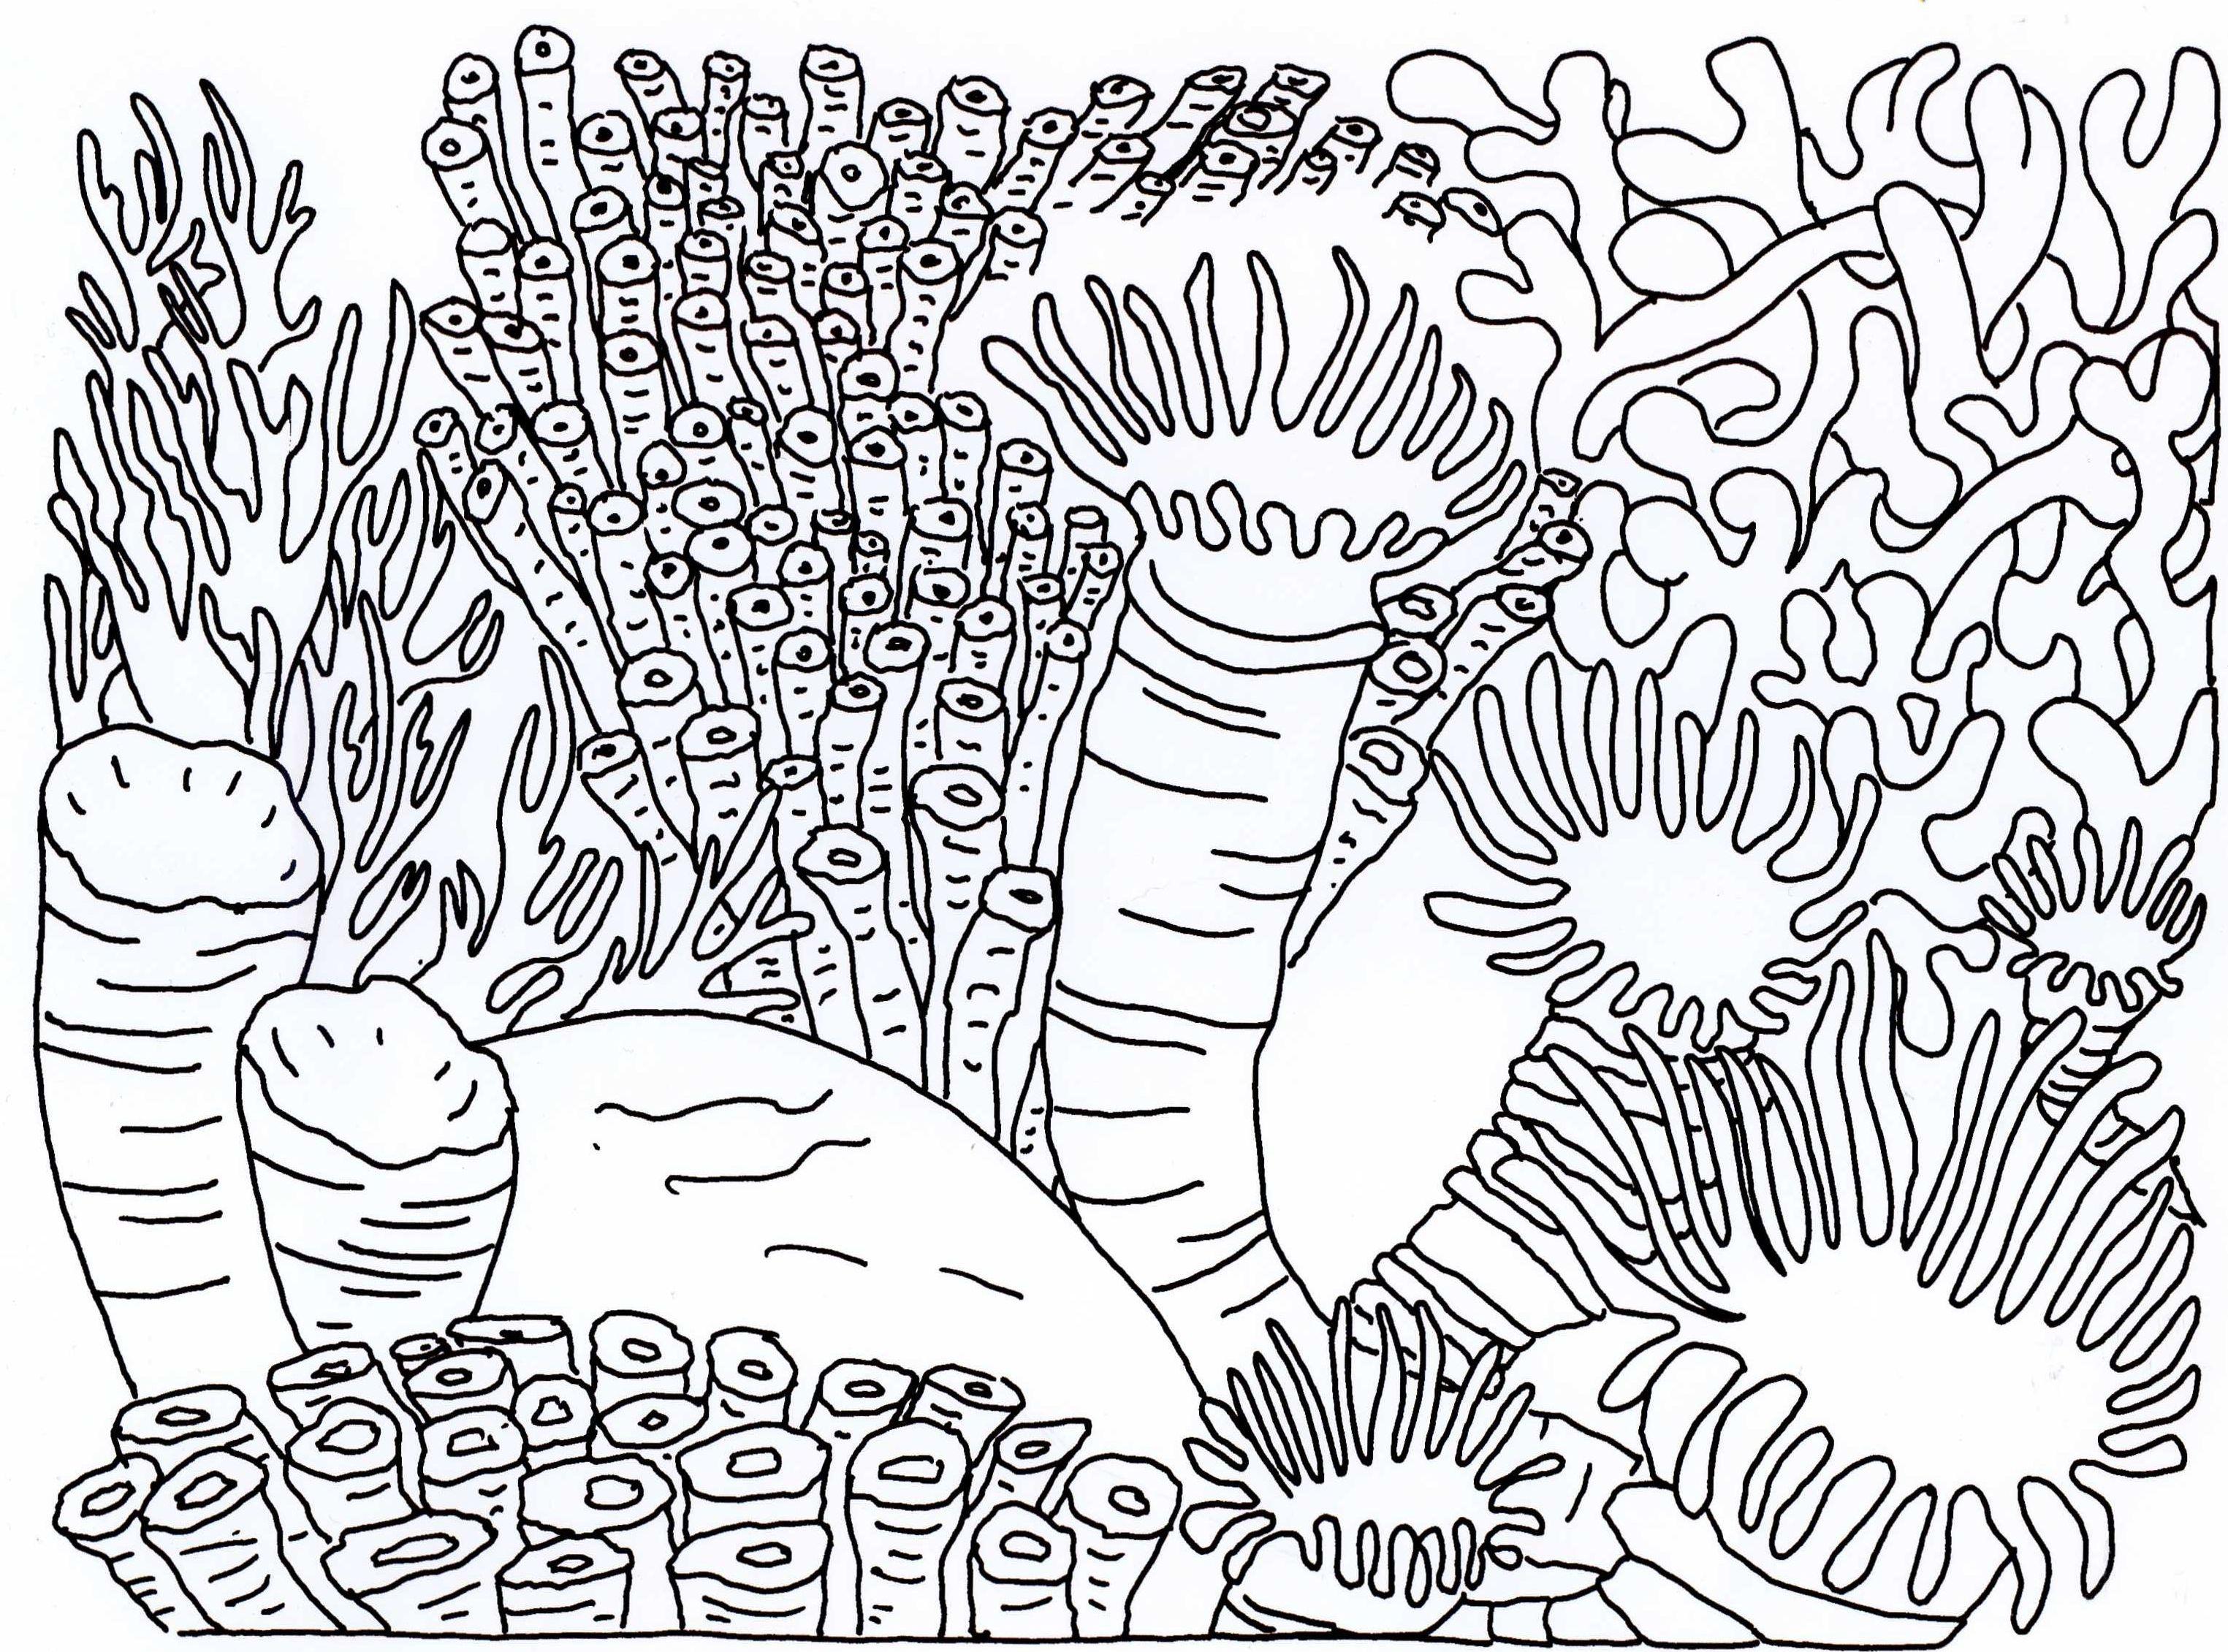 Coral Line Drawing at GetDrawings